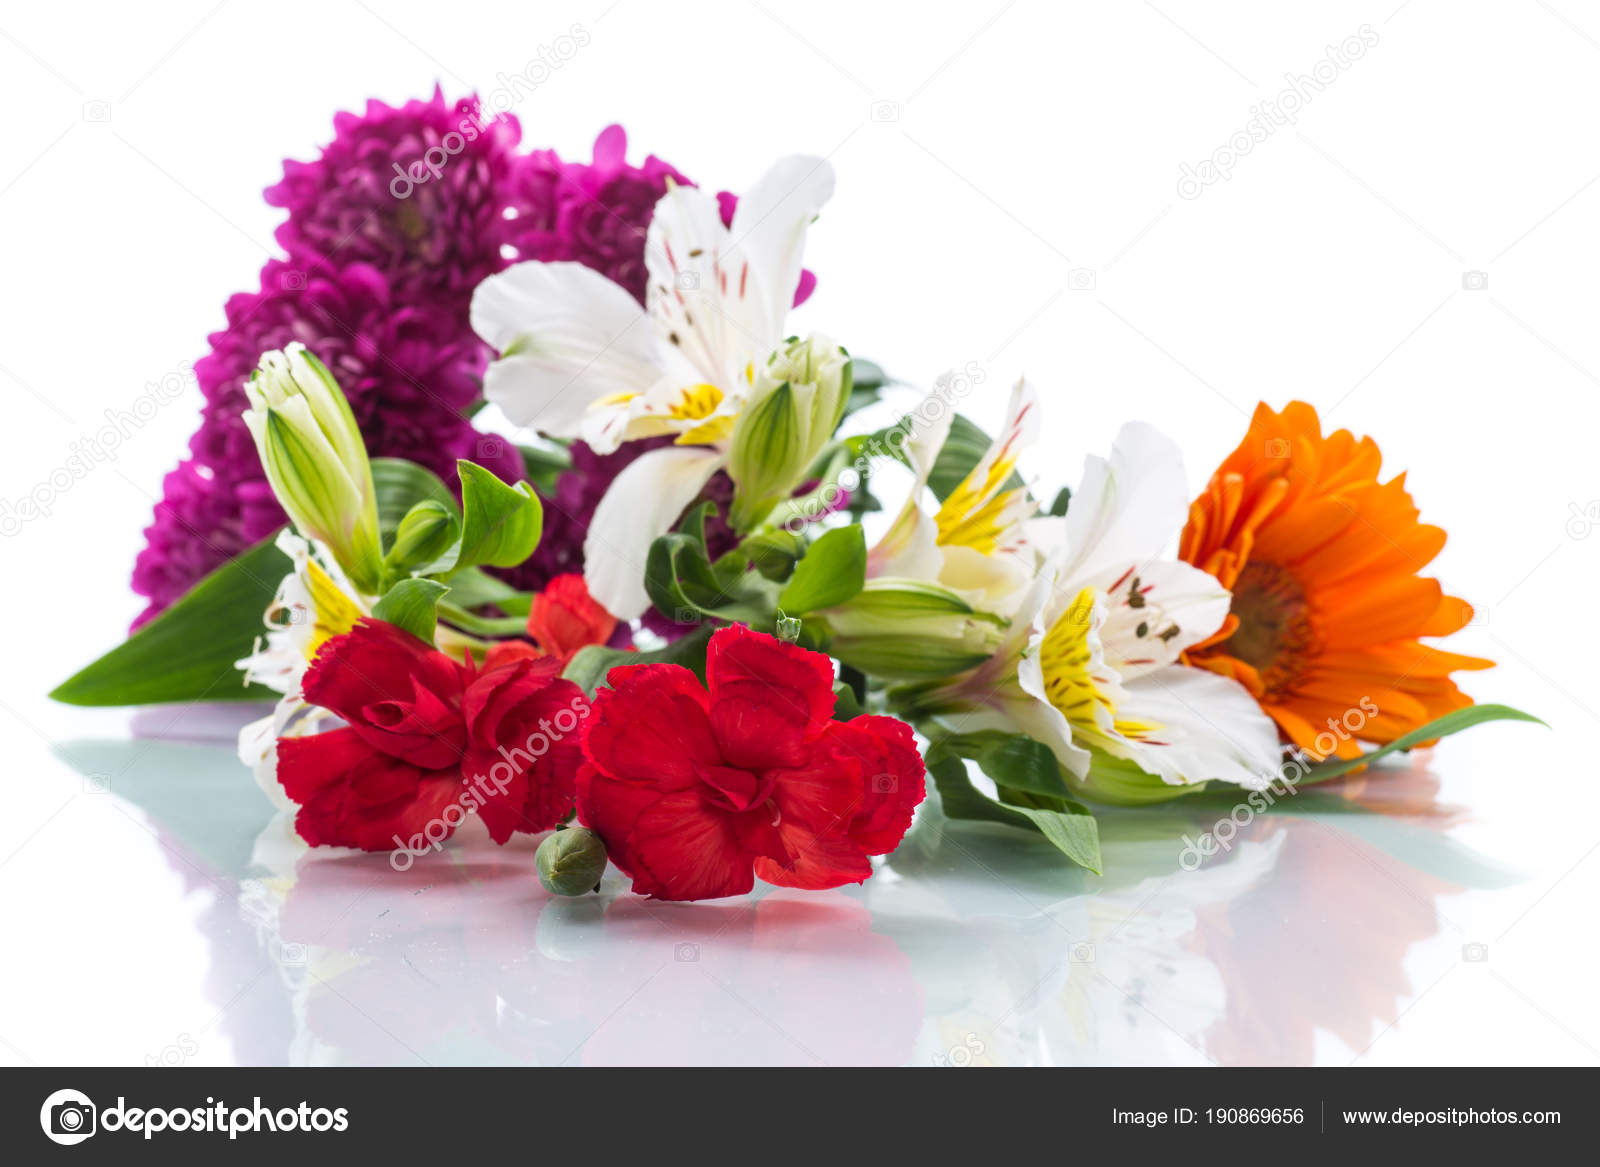 Beautiful bouquet of different flowers stock photo rawlik 190869656 beautiful bouquet of different flowers on white background photo by rawlik izmirmasajfo